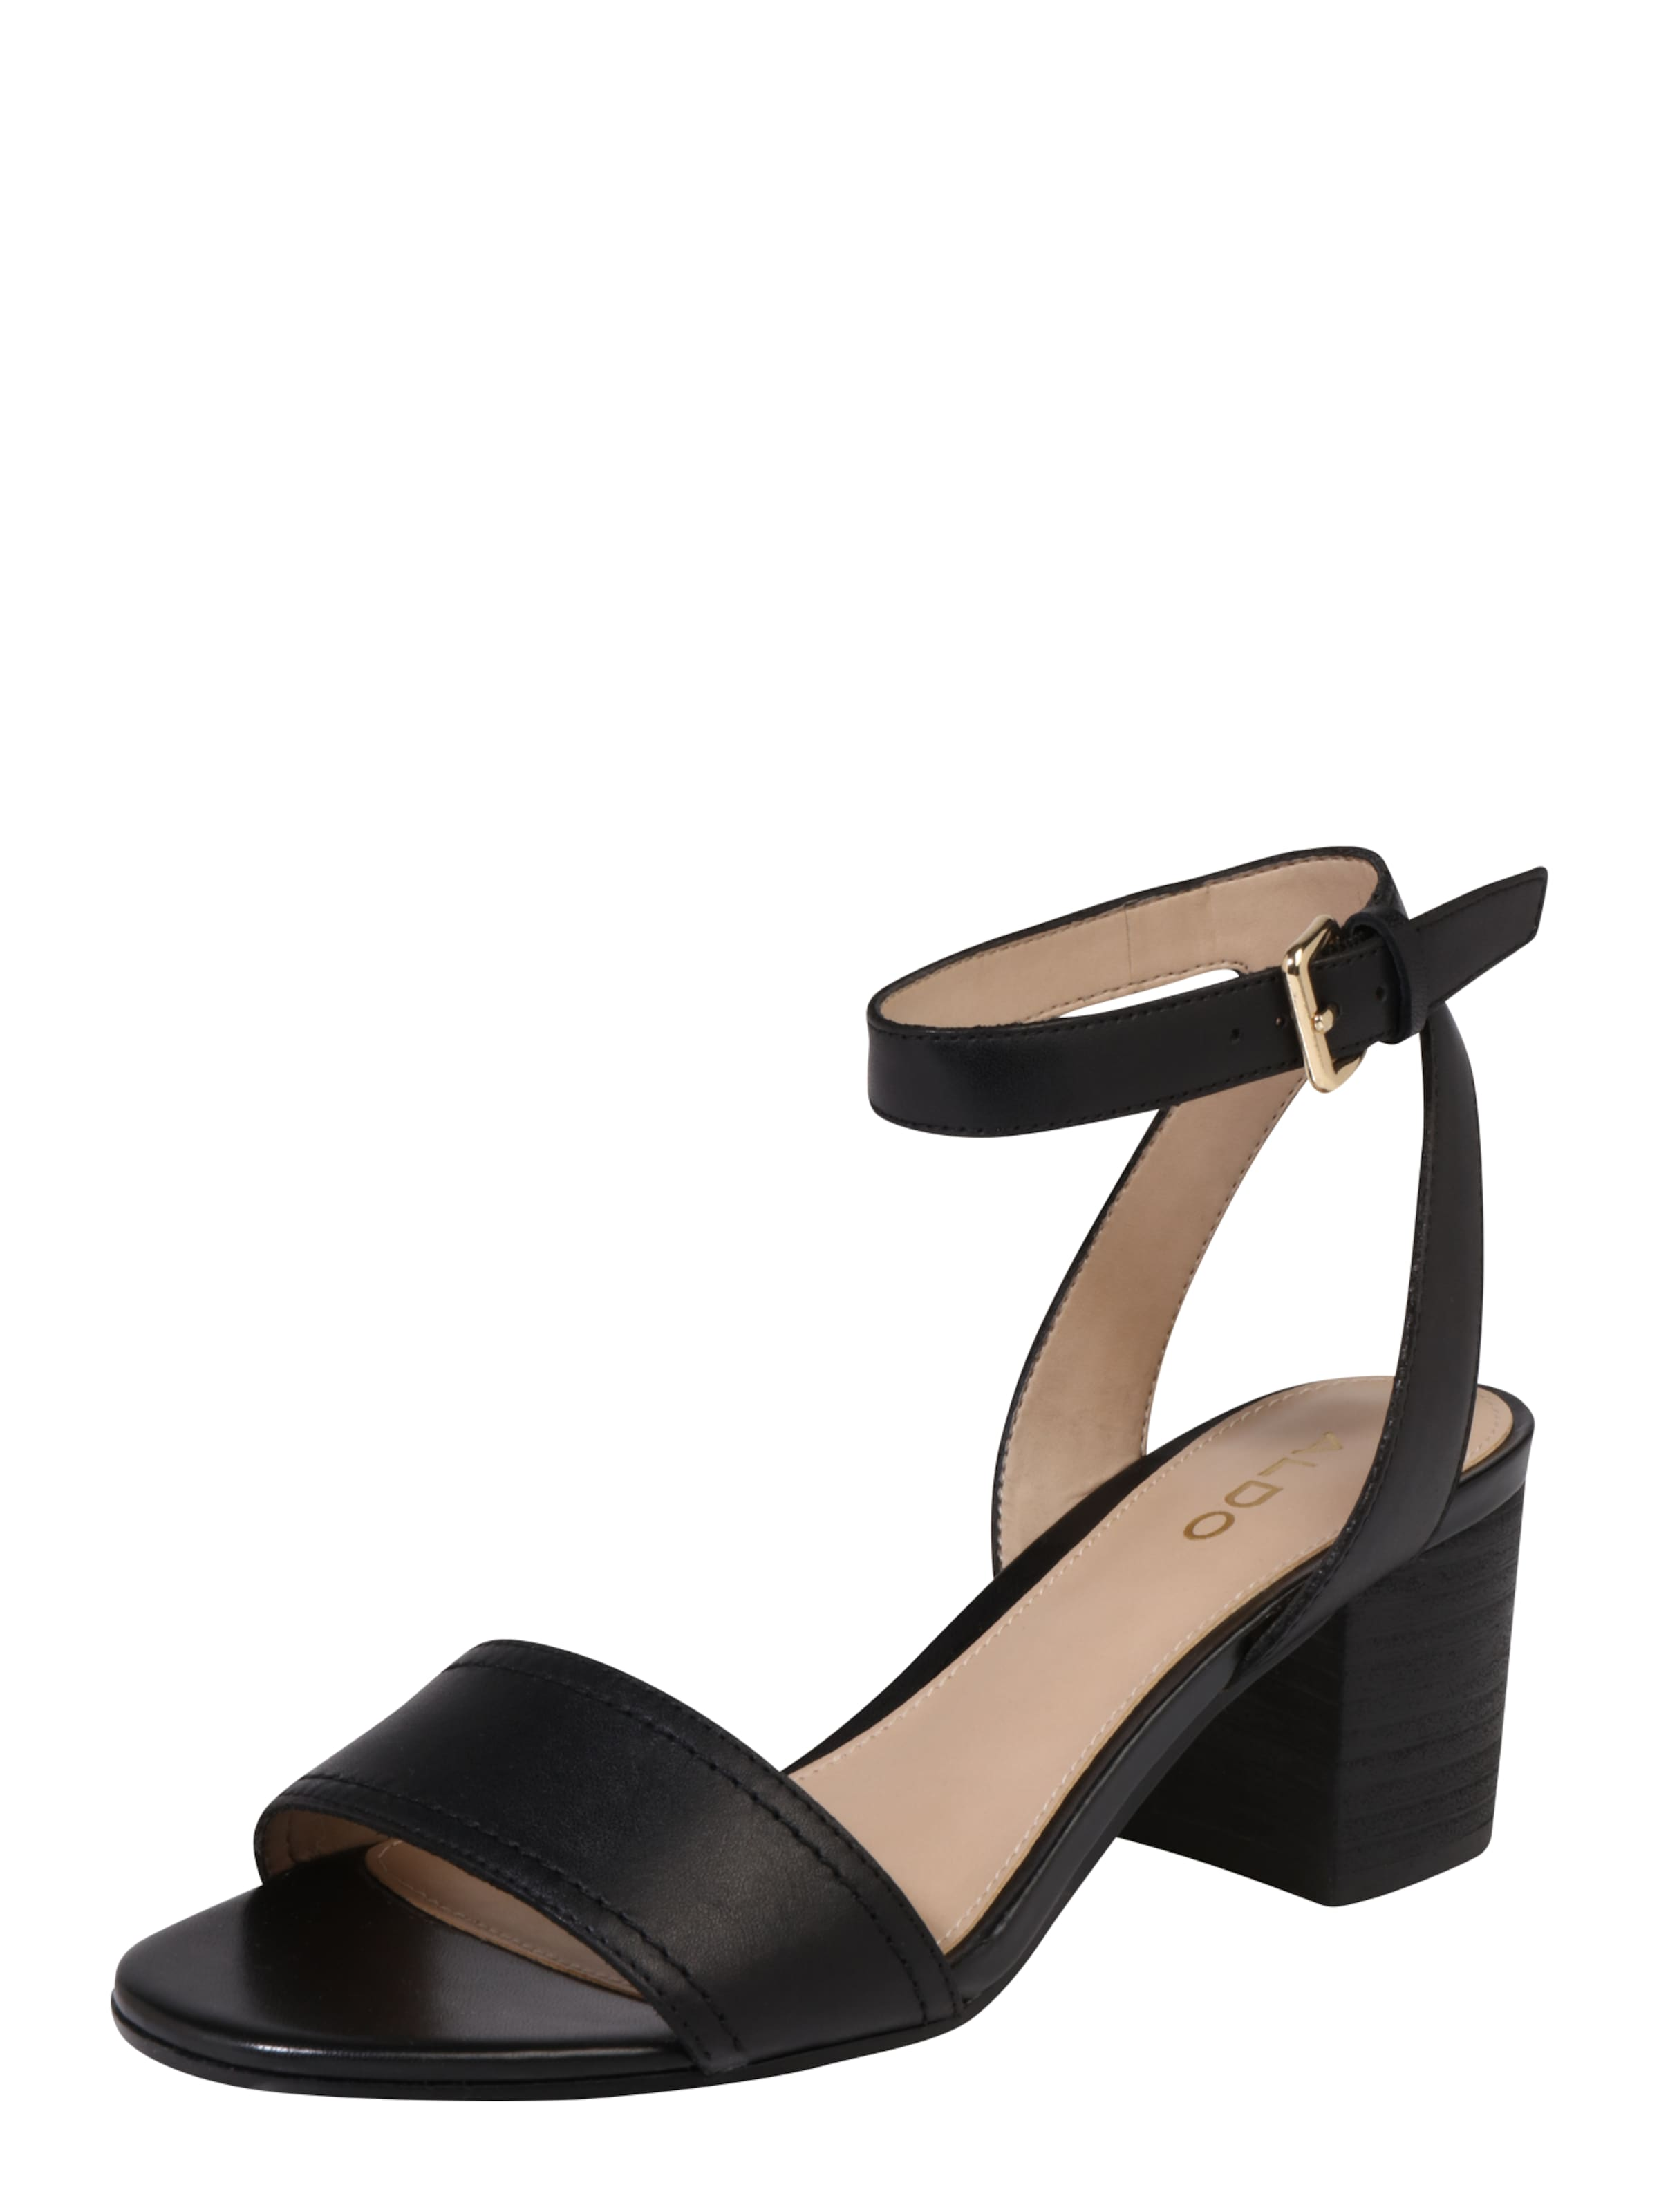 ALDO Riemensandale LOLLA Verschleißfeste billige Schuhe